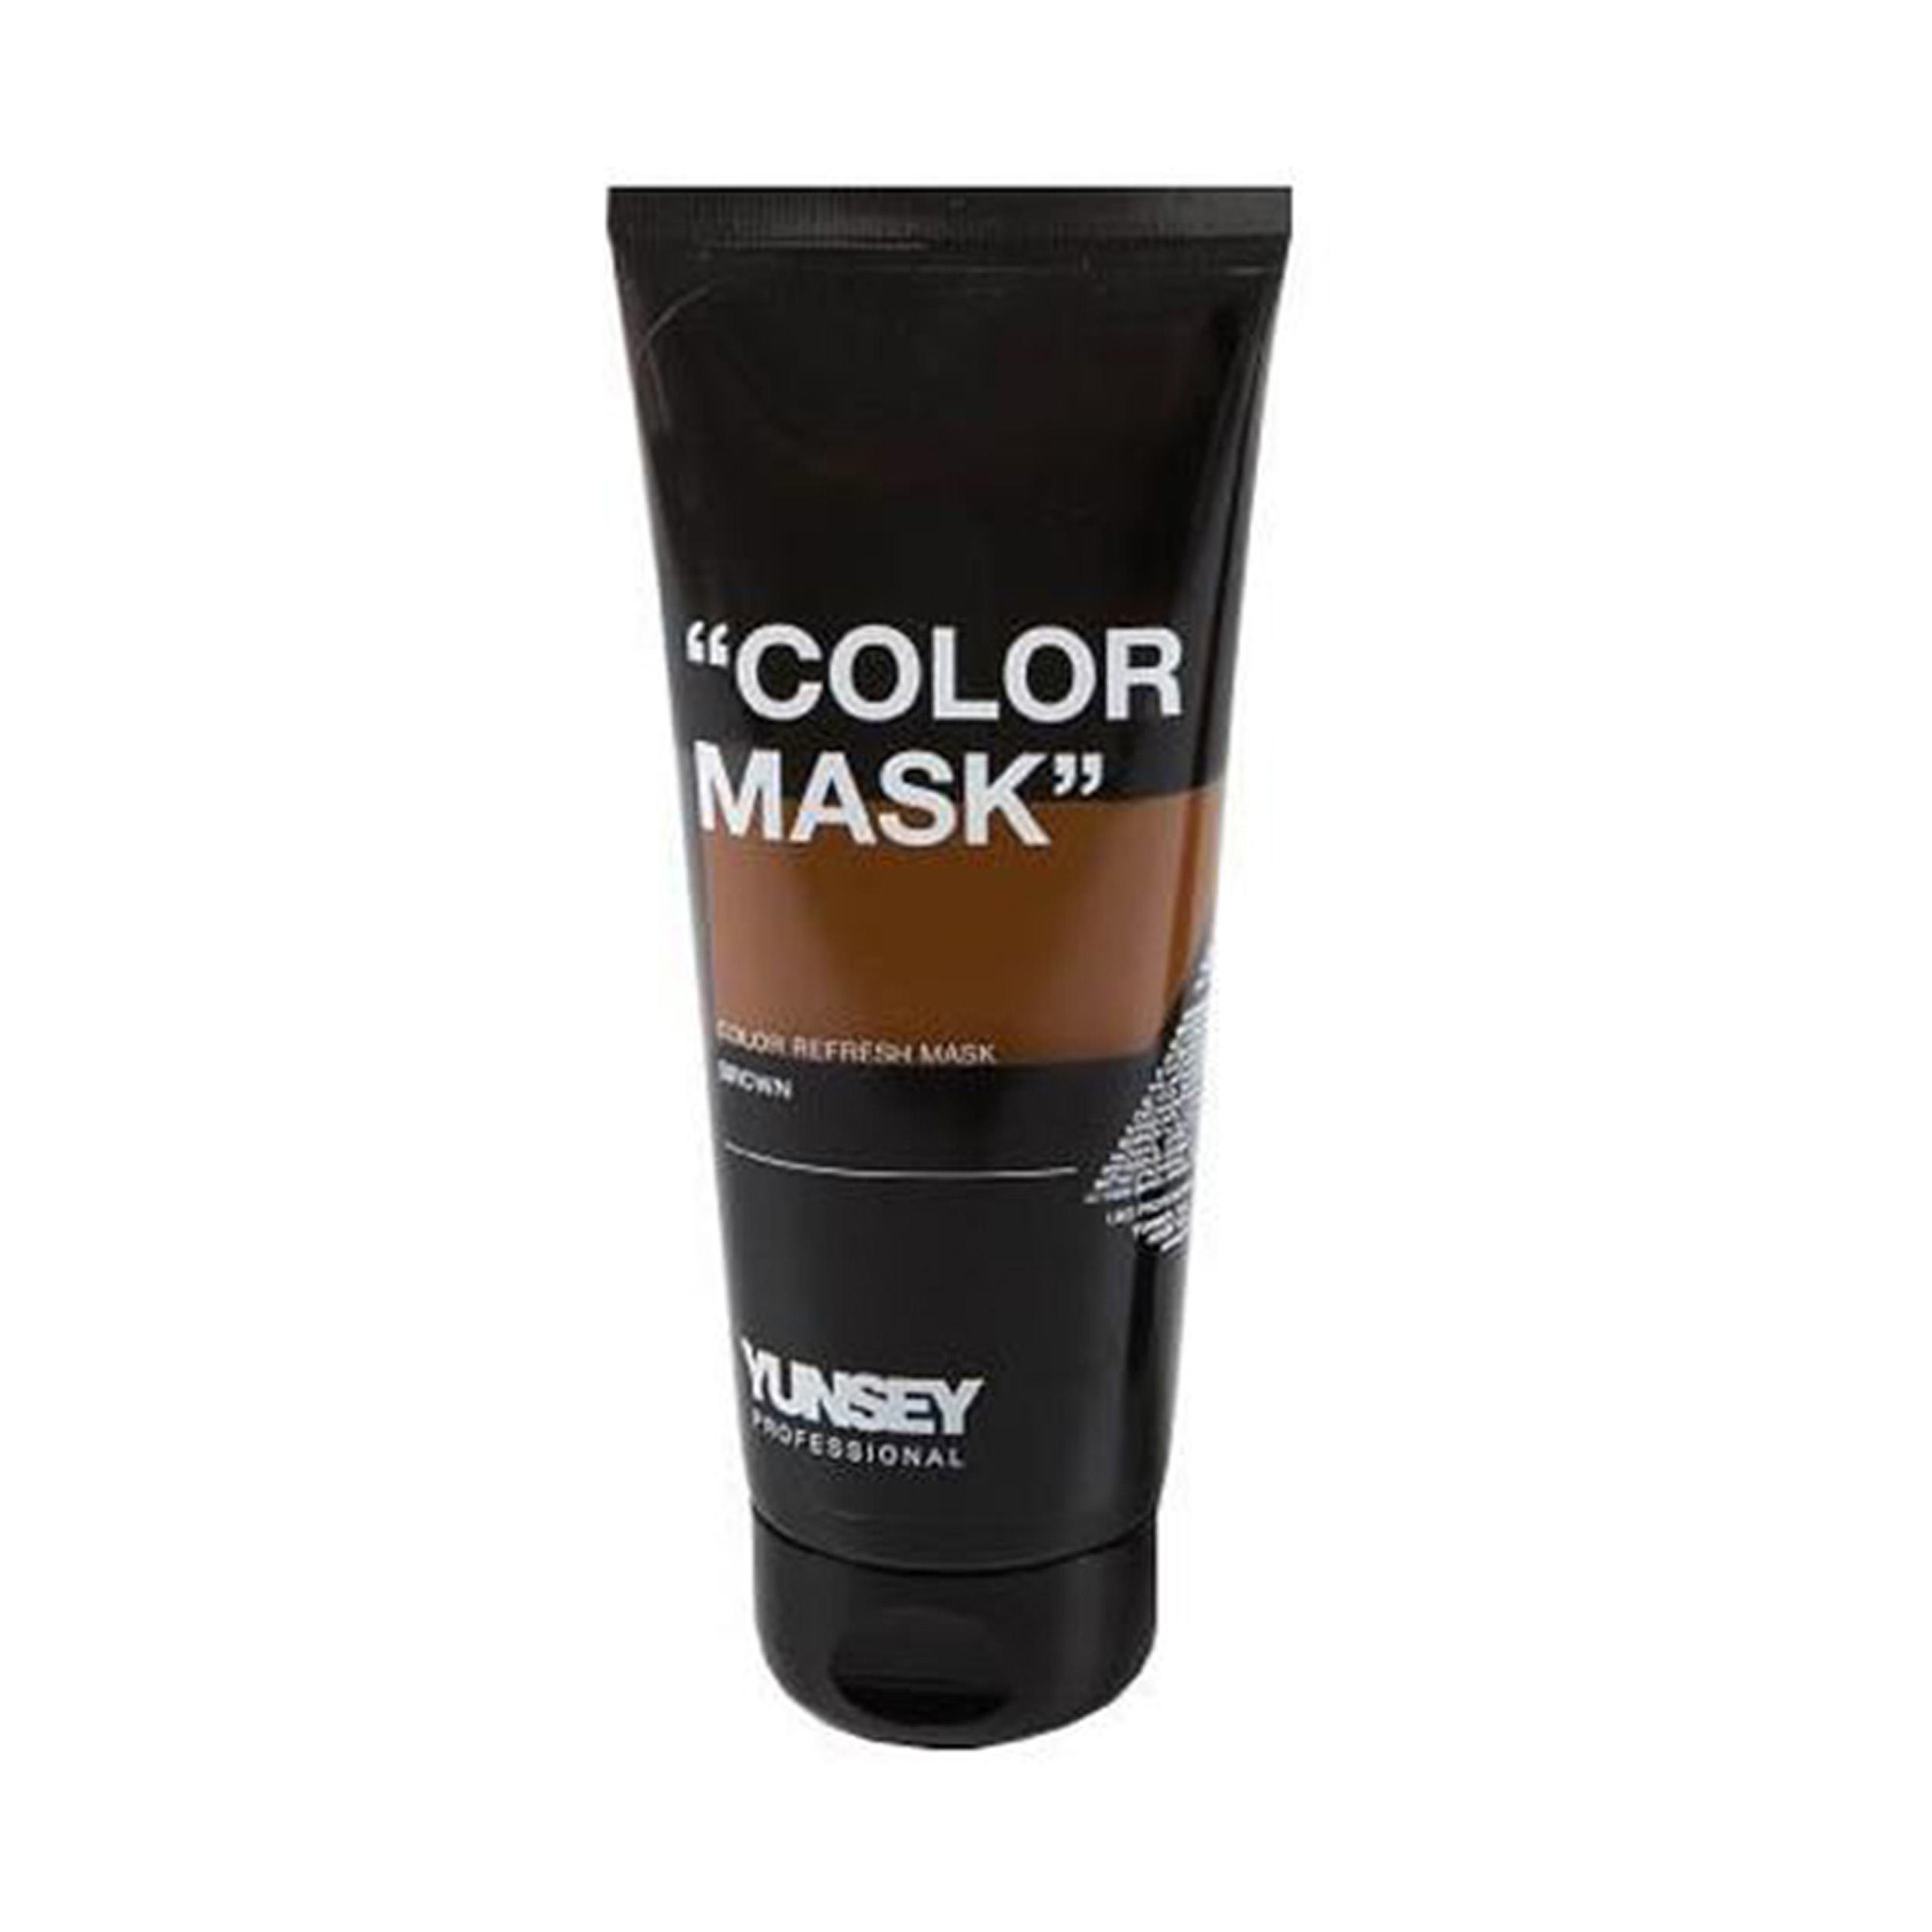 ماسک مو رنگساژ یانسی حجم 200 میلی لیتر کد 06 رنگ قهوه ای